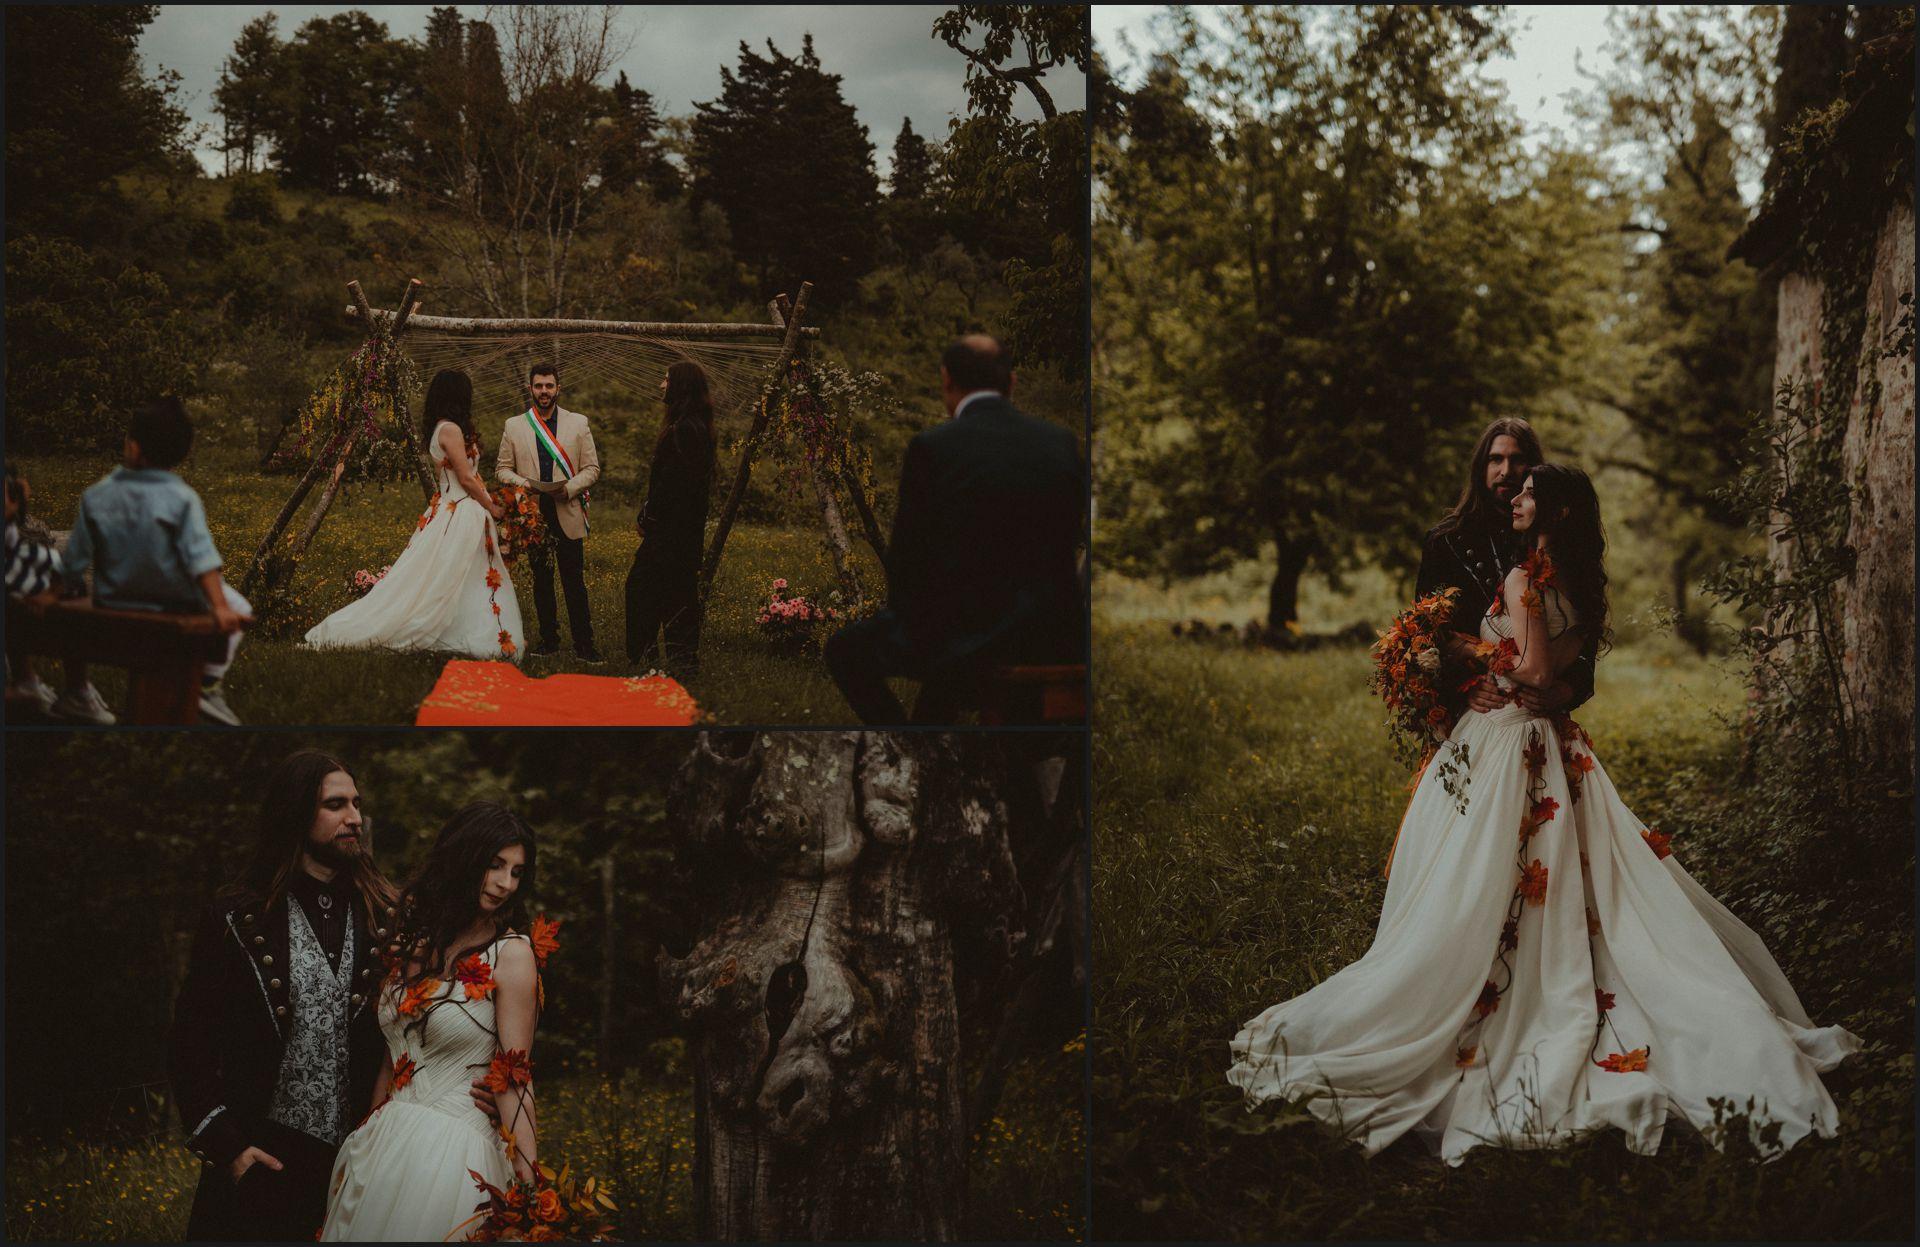 tuscany, alternative wedding, bride, couple portrait